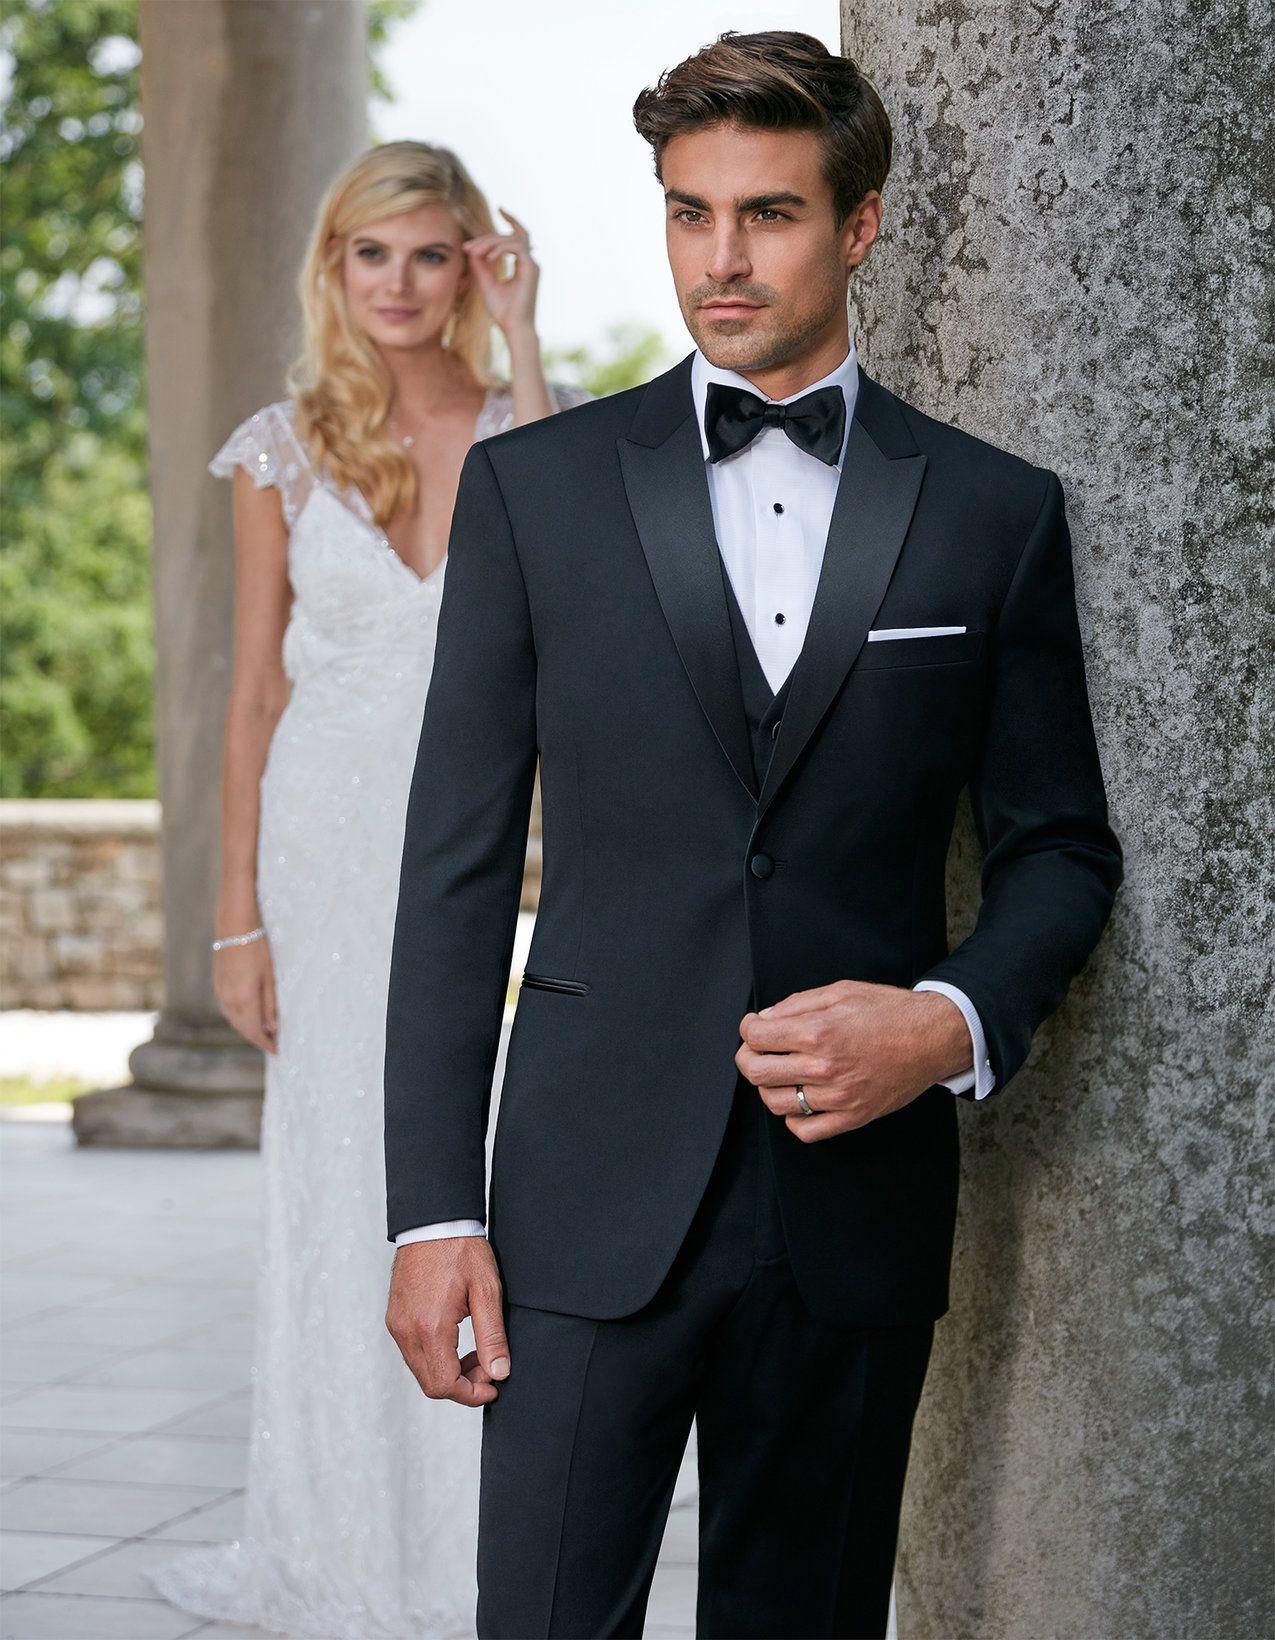 Black Pietro Modern Tuxedo Men Fashion Casual Shirts Wedding Suits Men